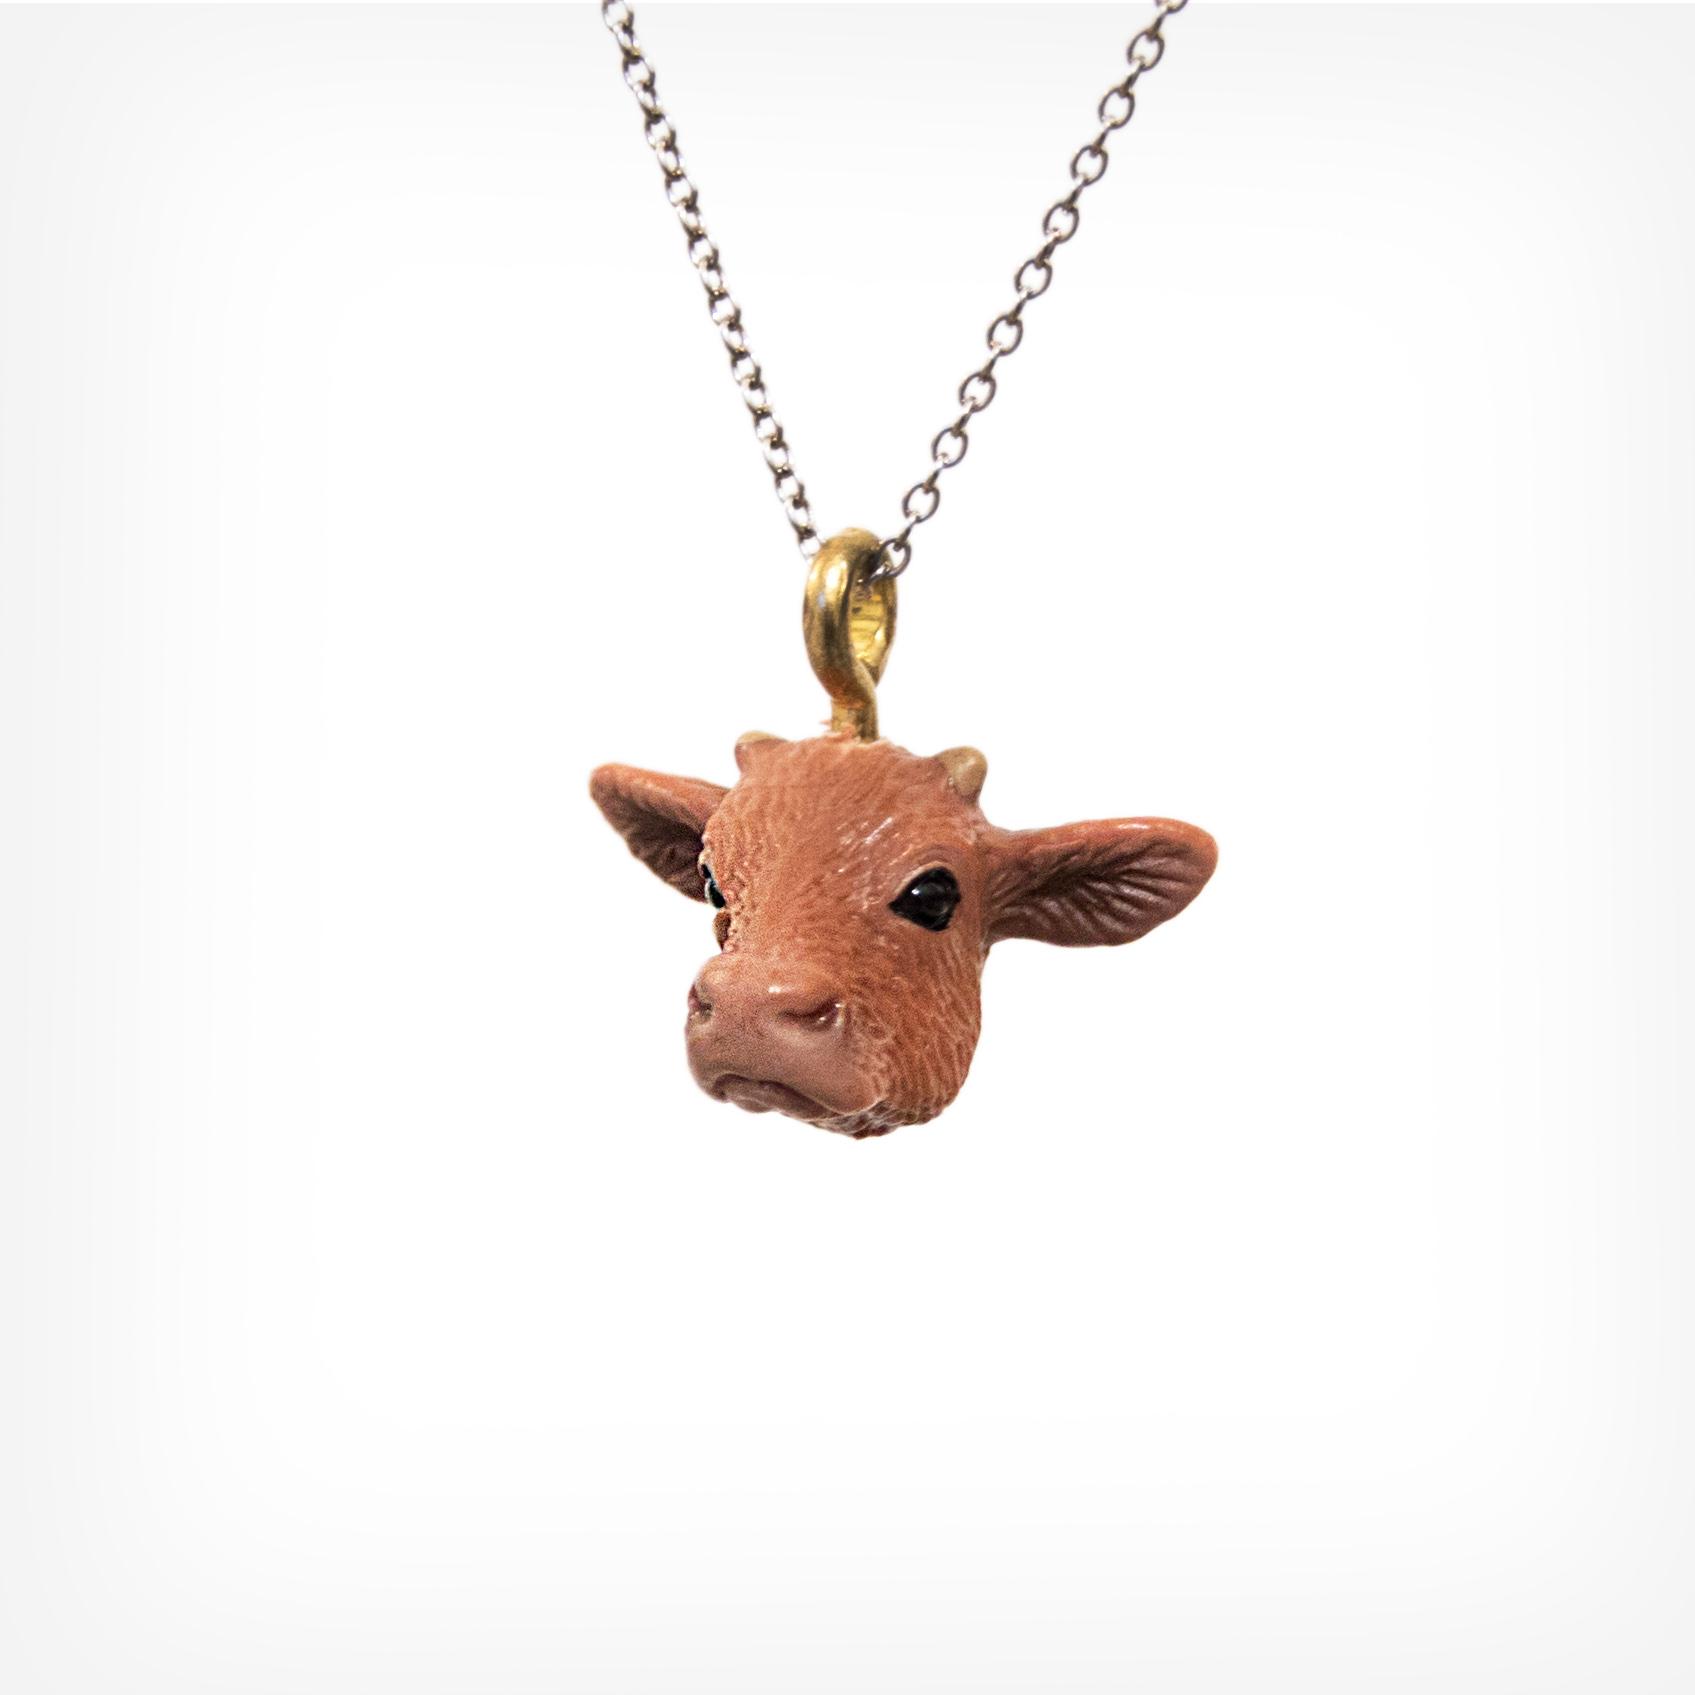 Kuh | cow